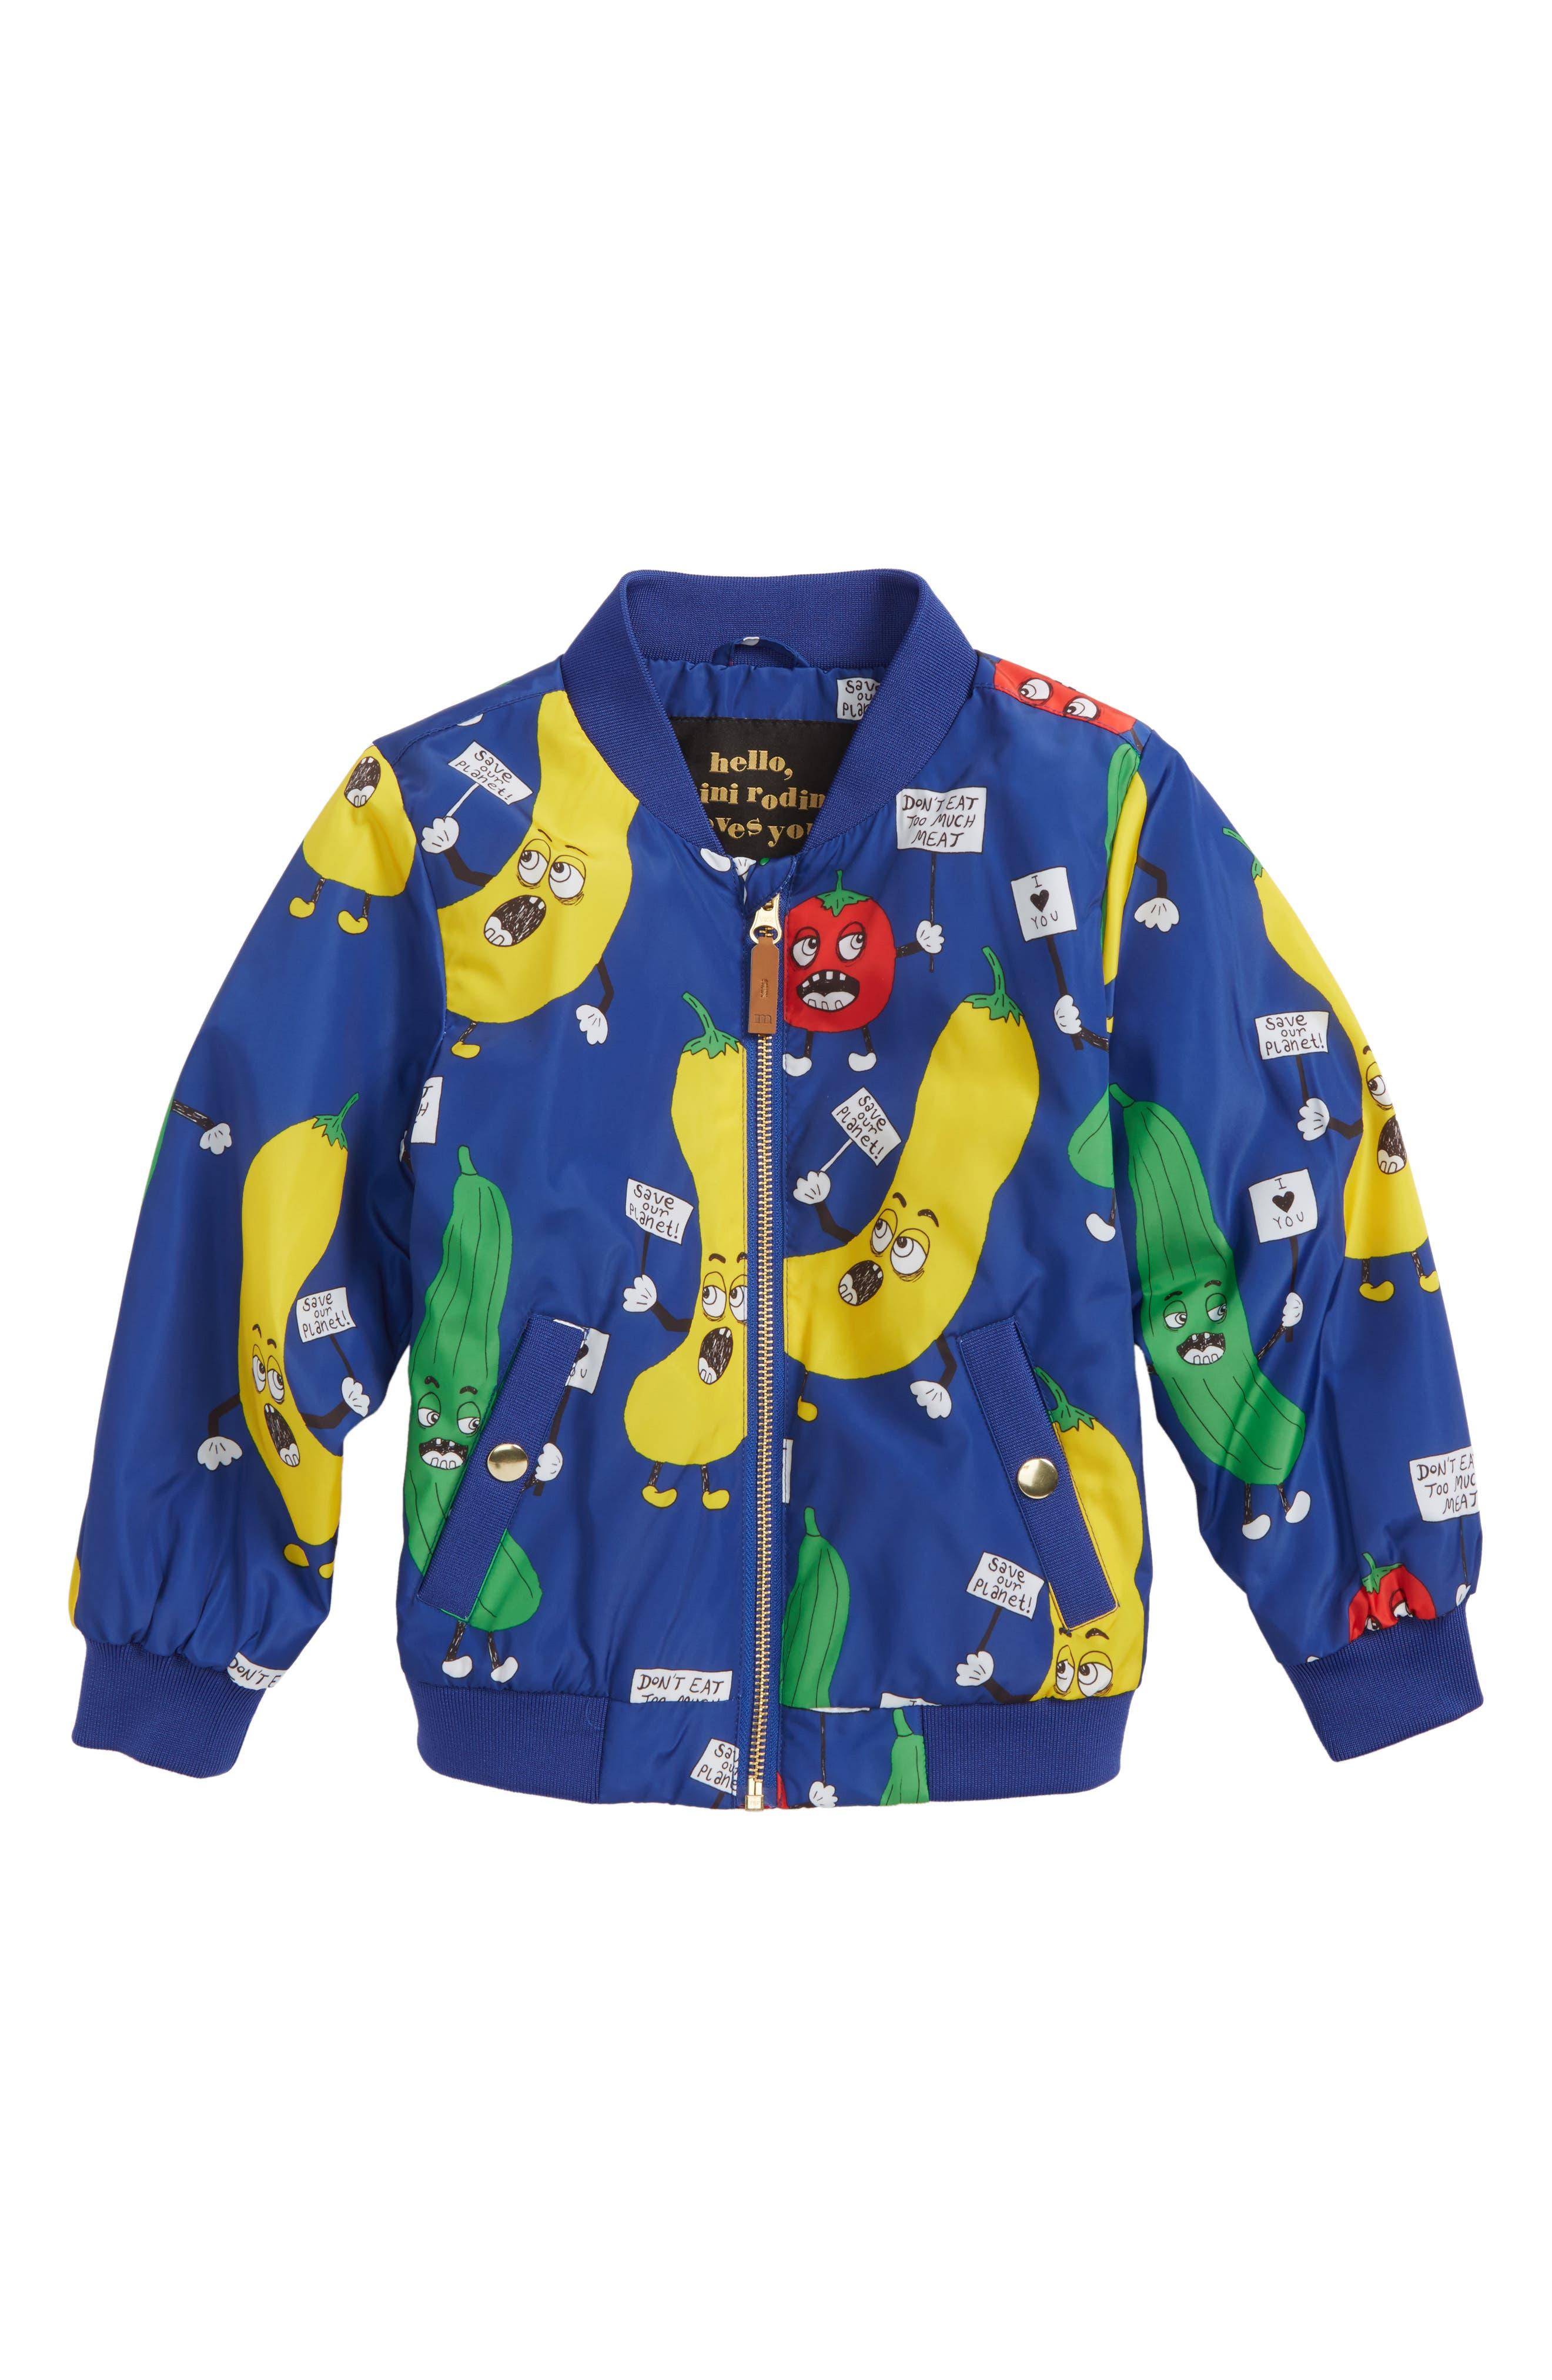 Alternate Image 1 Selected - Mini Rodini Veggie Weatherproof Baseball Jacket (Toddler Boys & Little Boys)